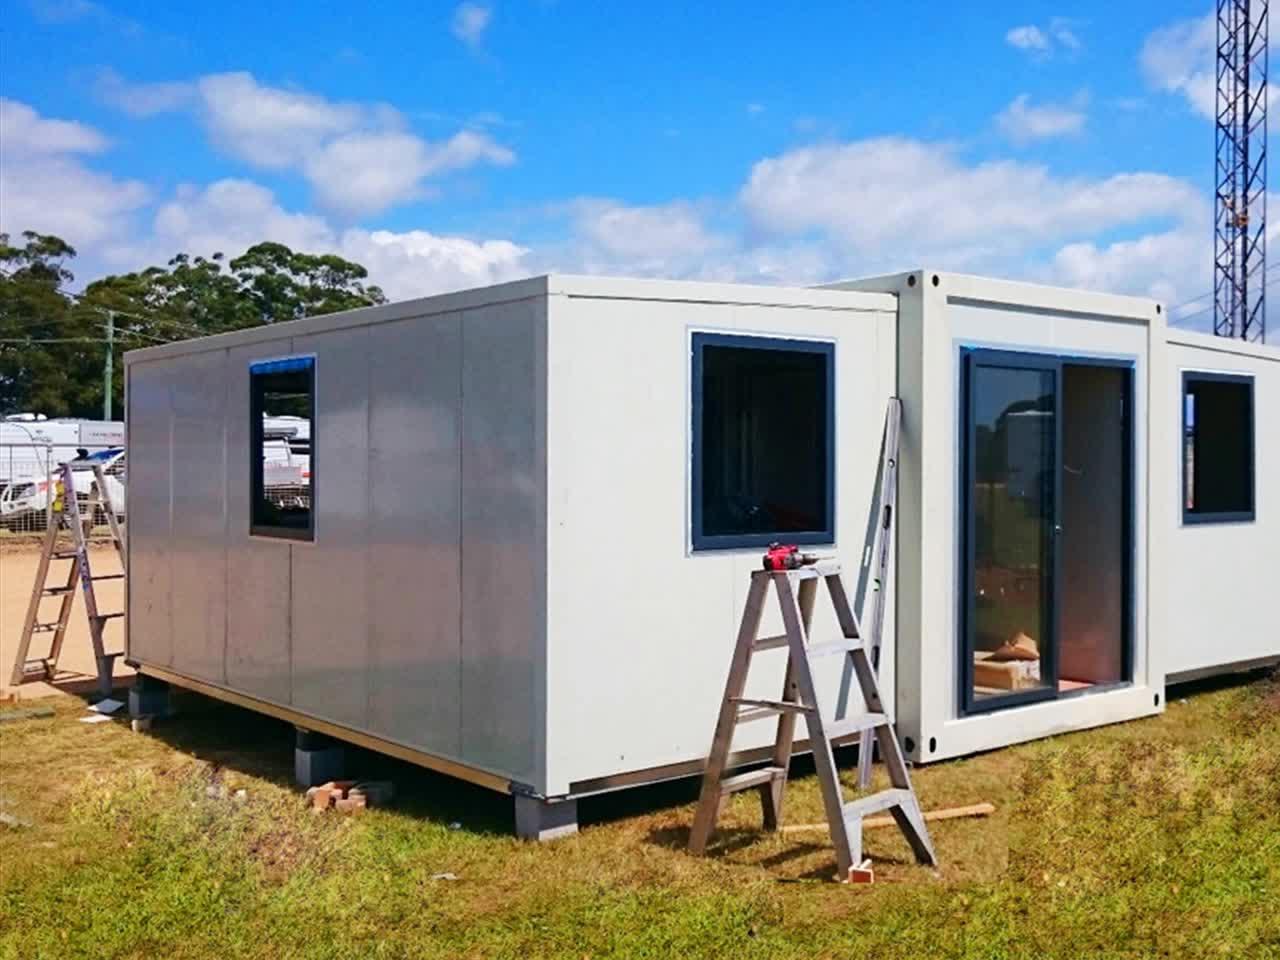 container haus preis bild so schn kann wohnen im container sein ecolife six oaks residence. Black Bedroom Furniture Sets. Home Design Ideas